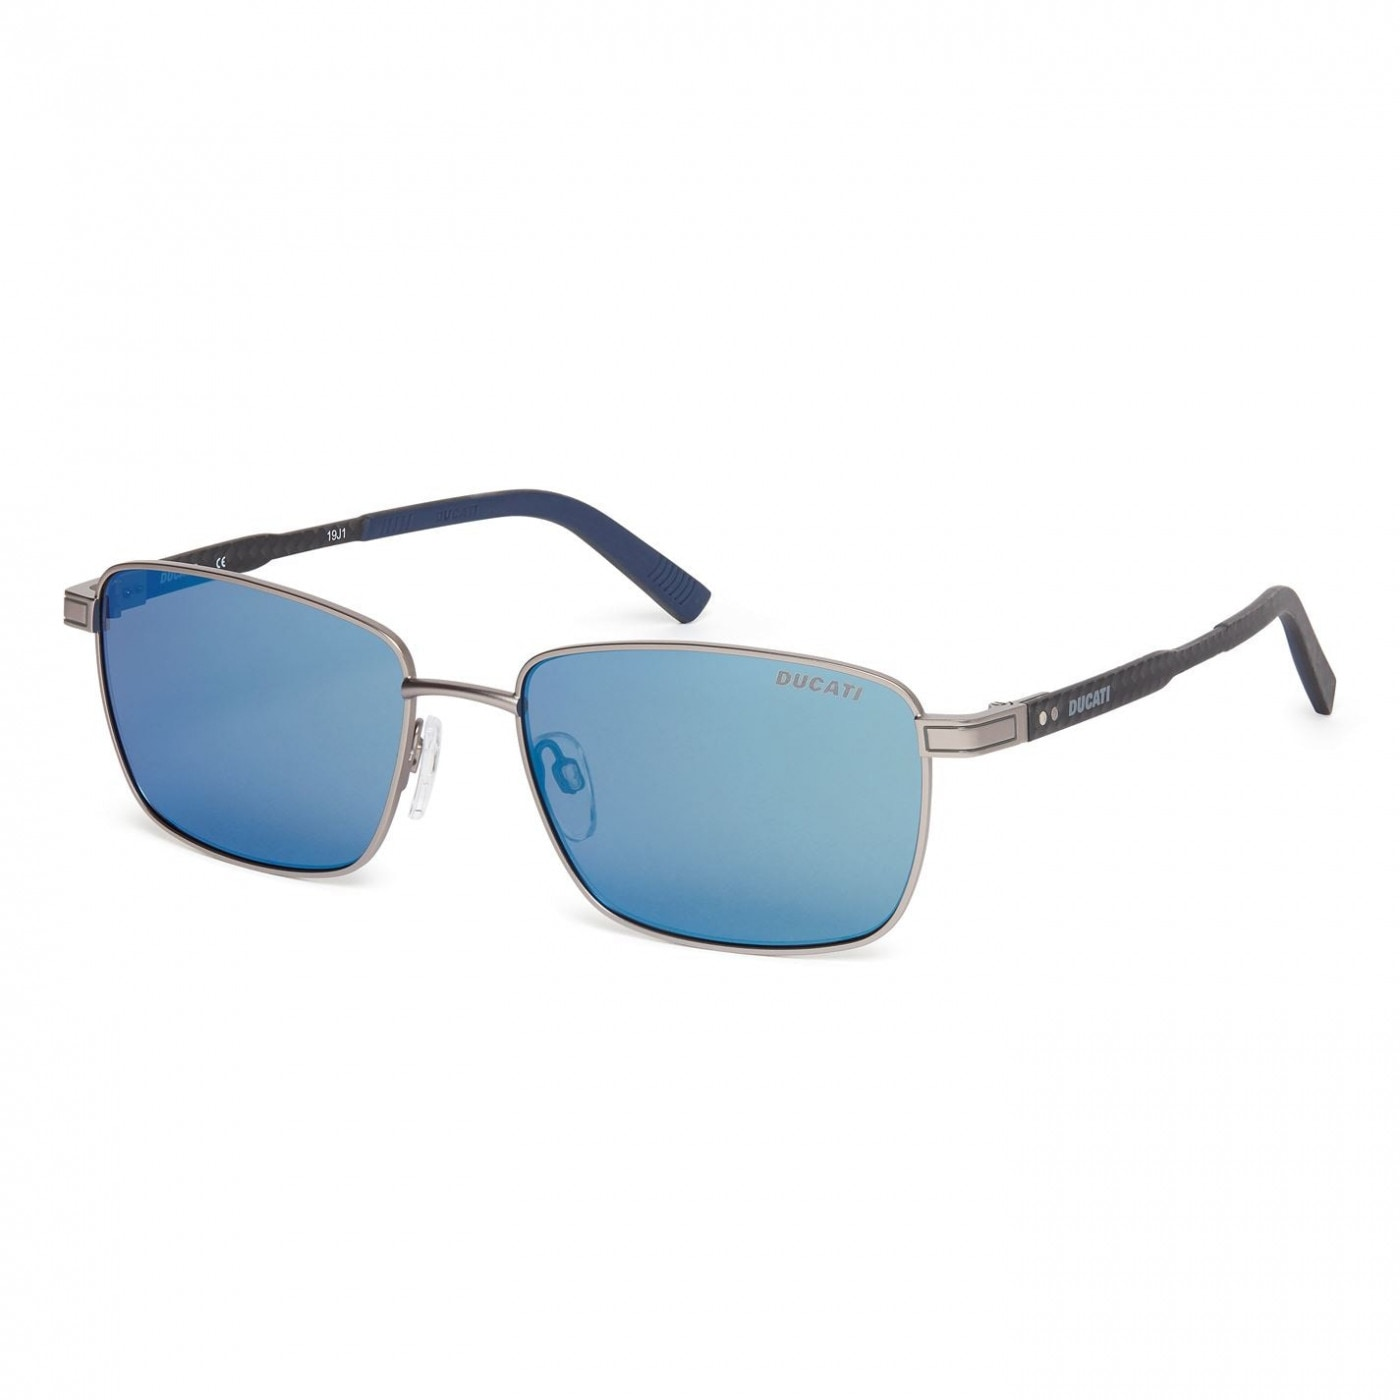 Ducati Sunglasses